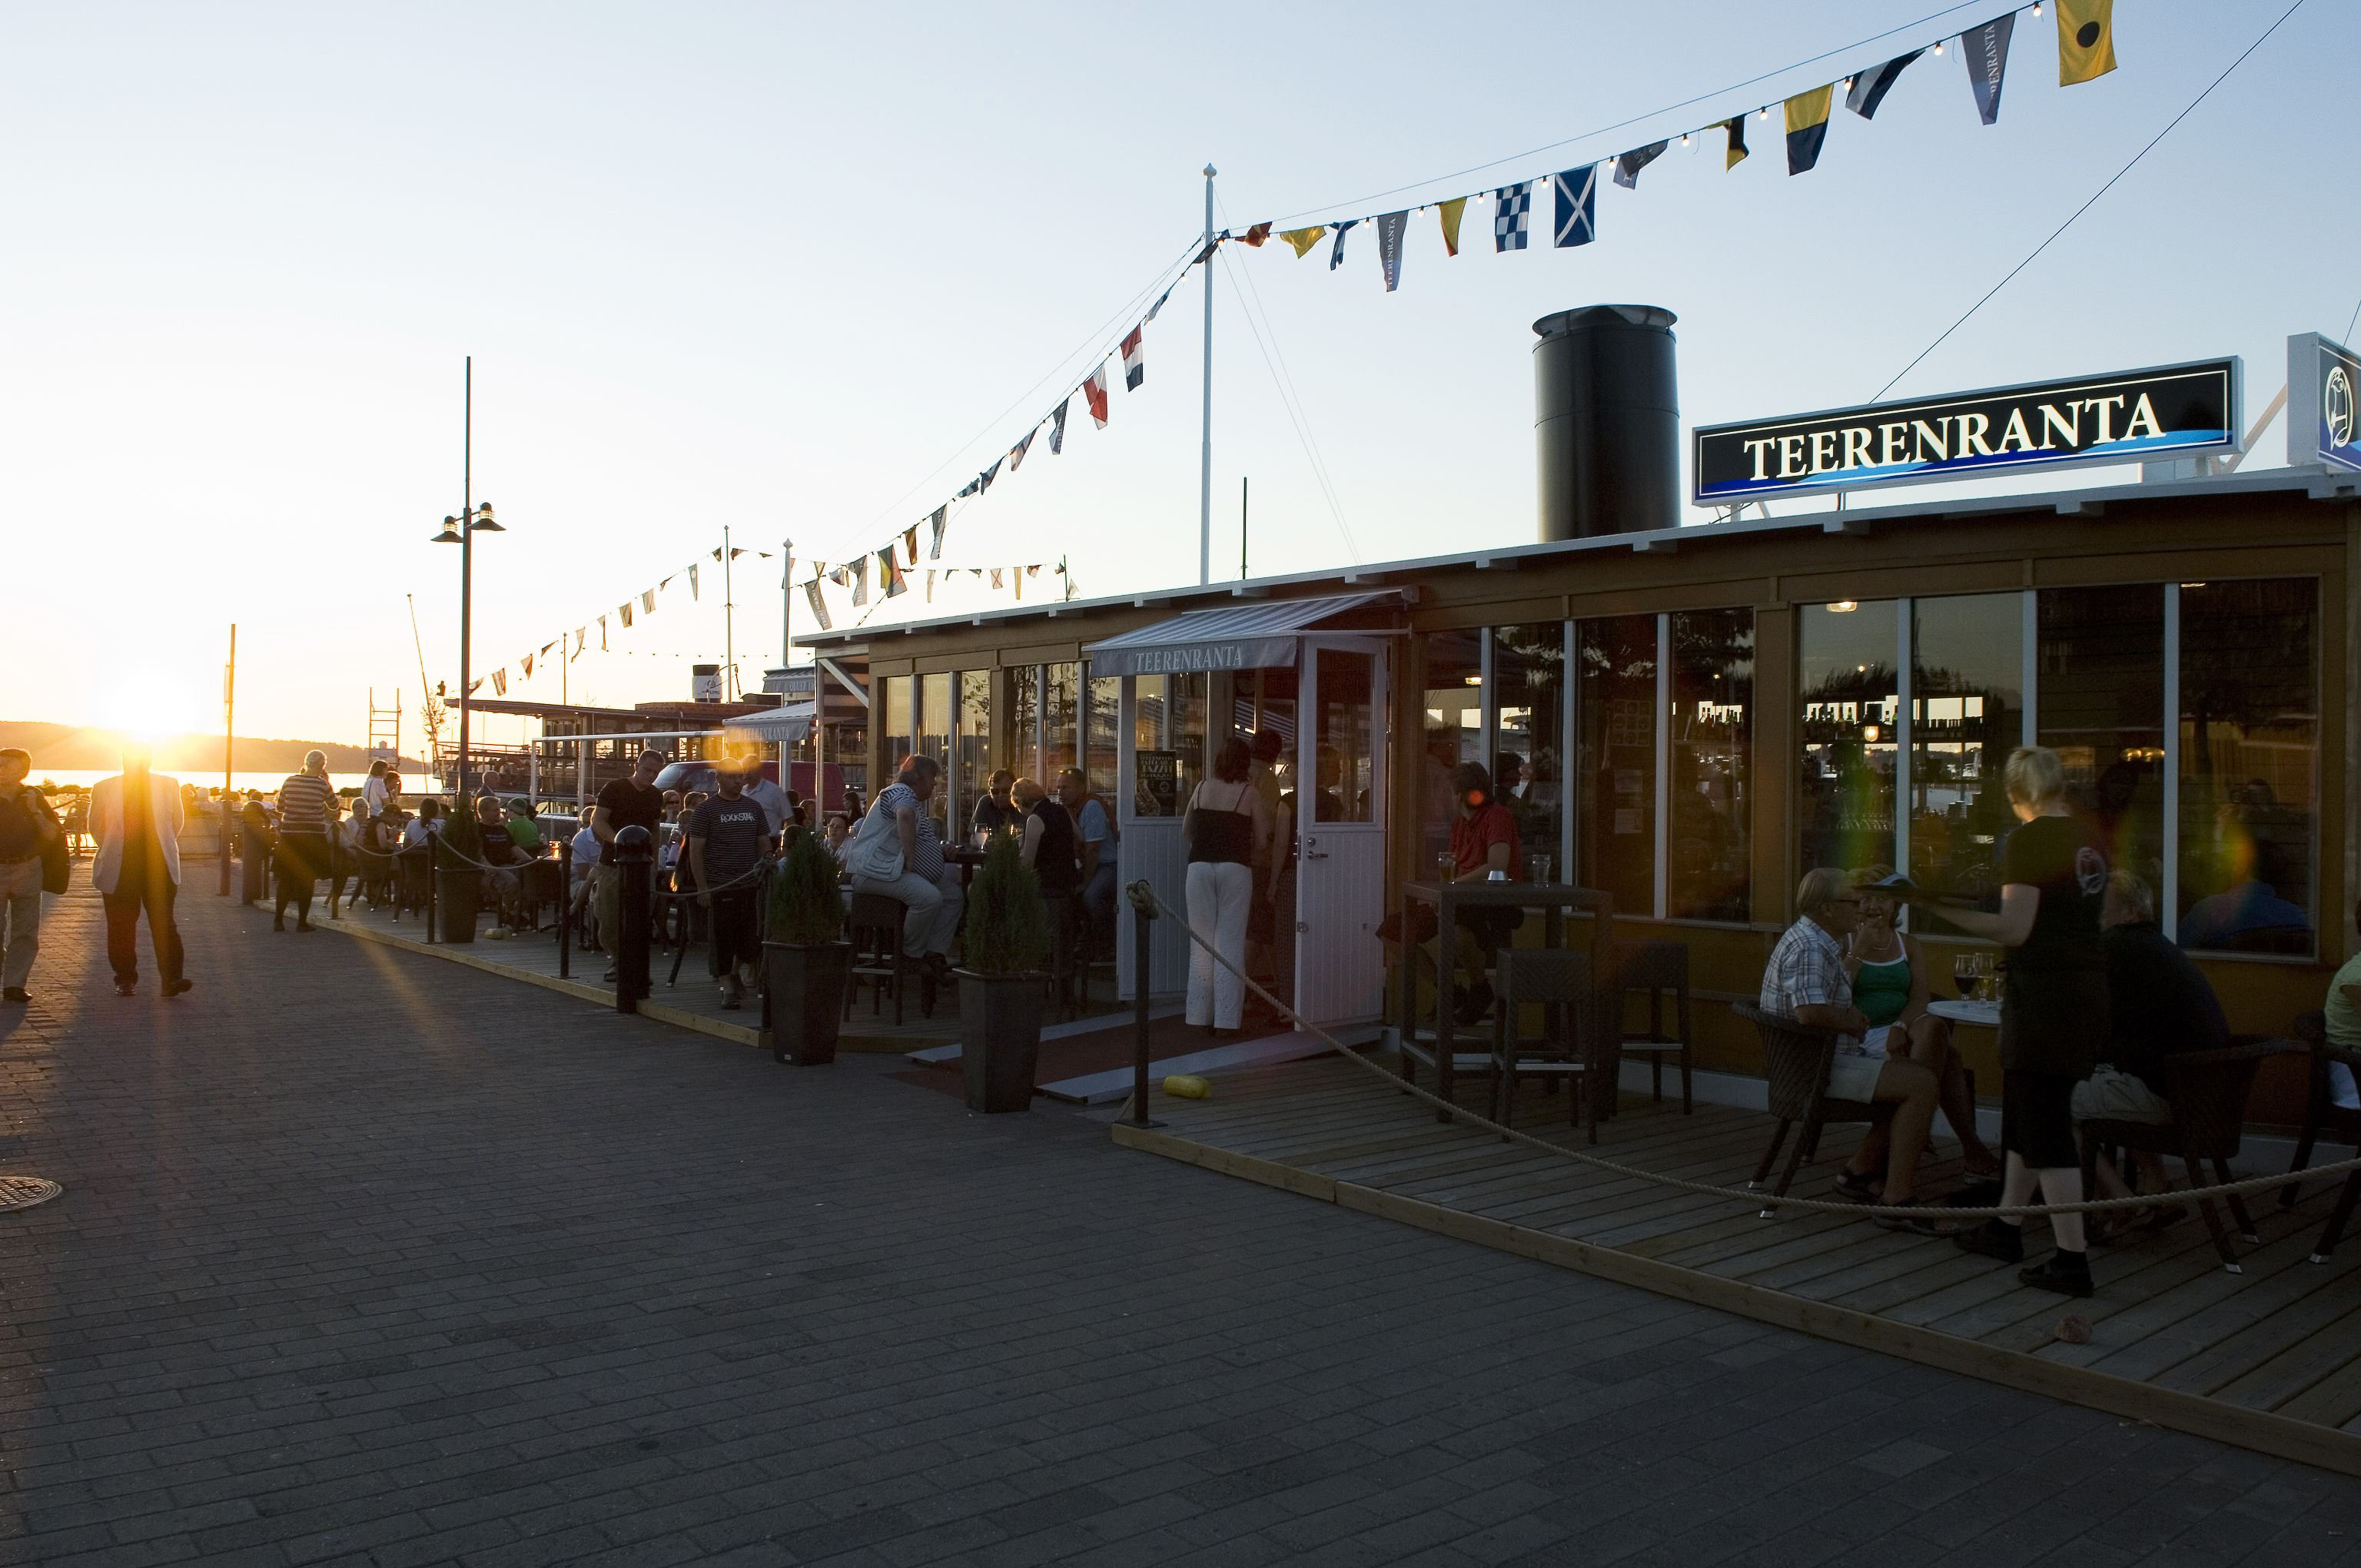 Laivaravintola Teerenranta